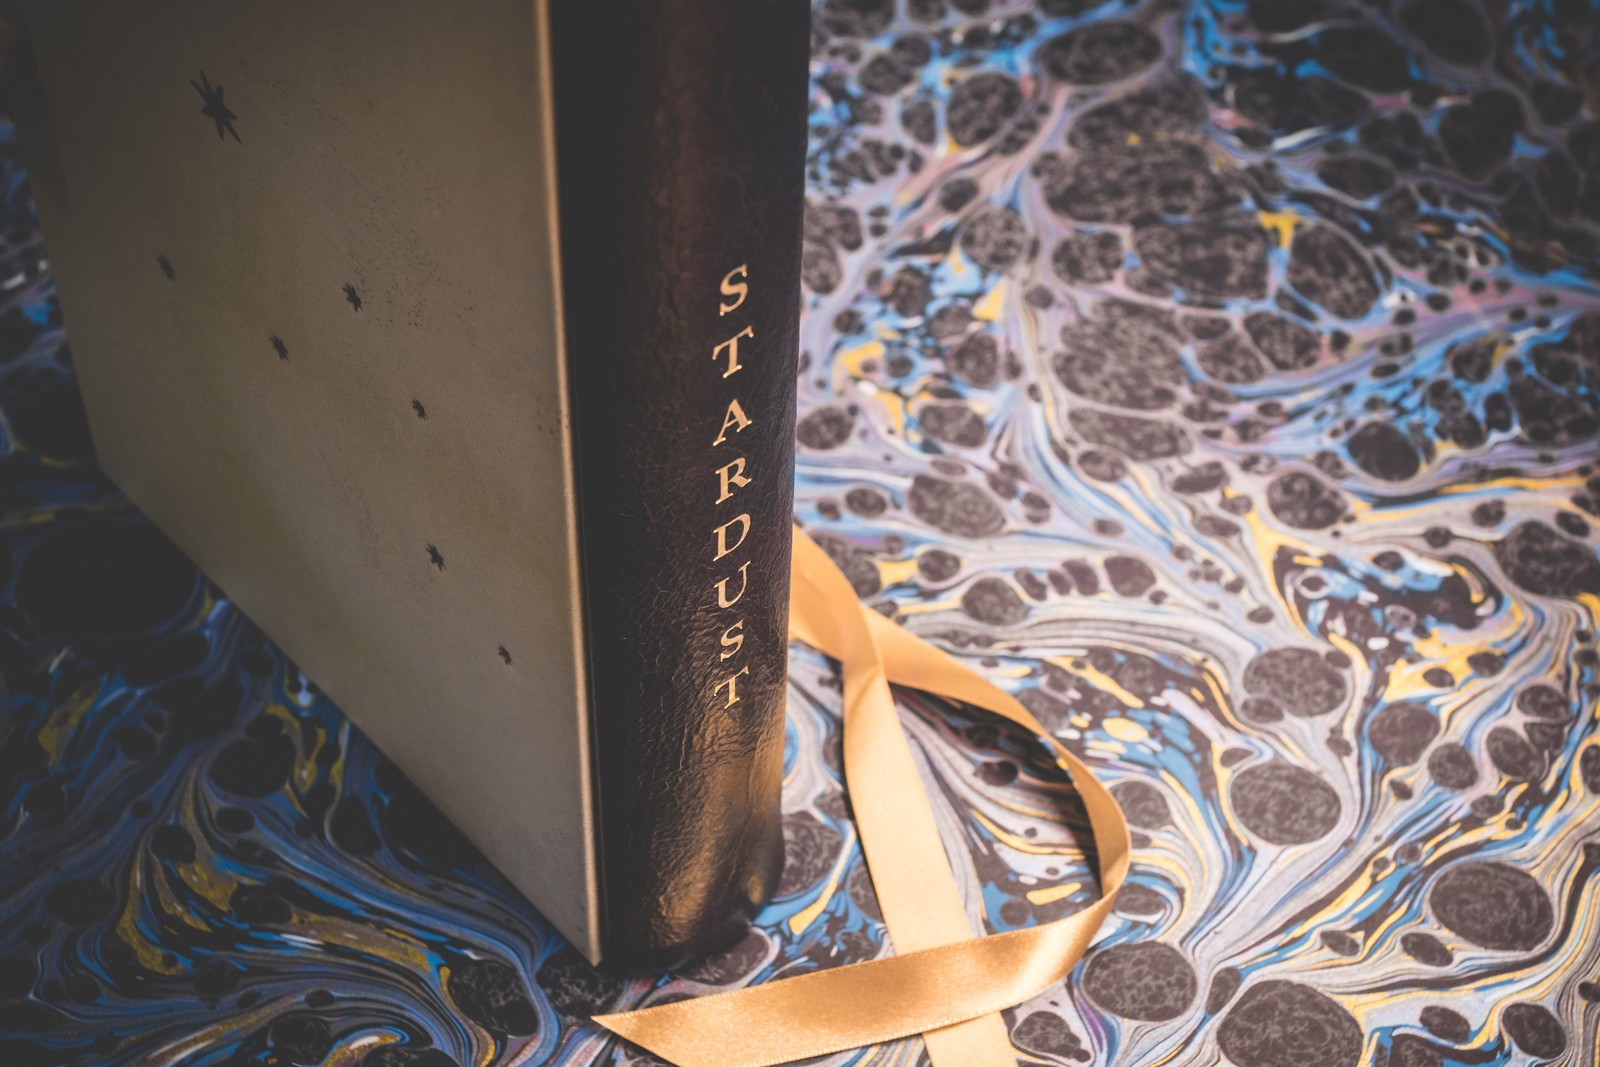 stardust-lettered-3